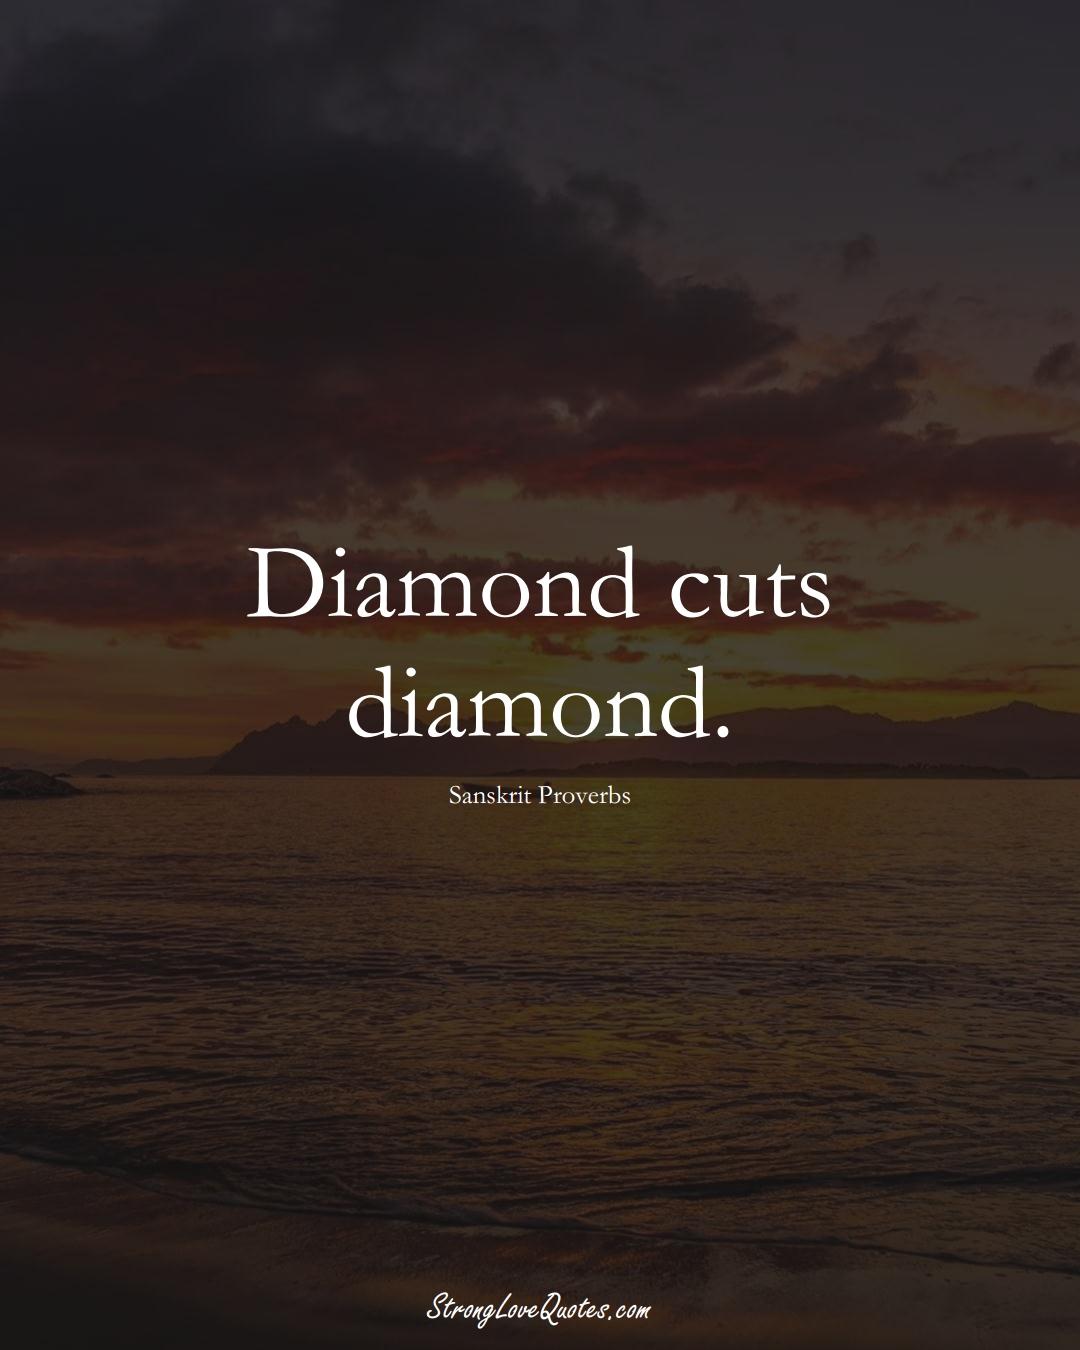 Diamond cuts diamond. (Sanskrit Sayings);  #aVarietyofCulturesSayings